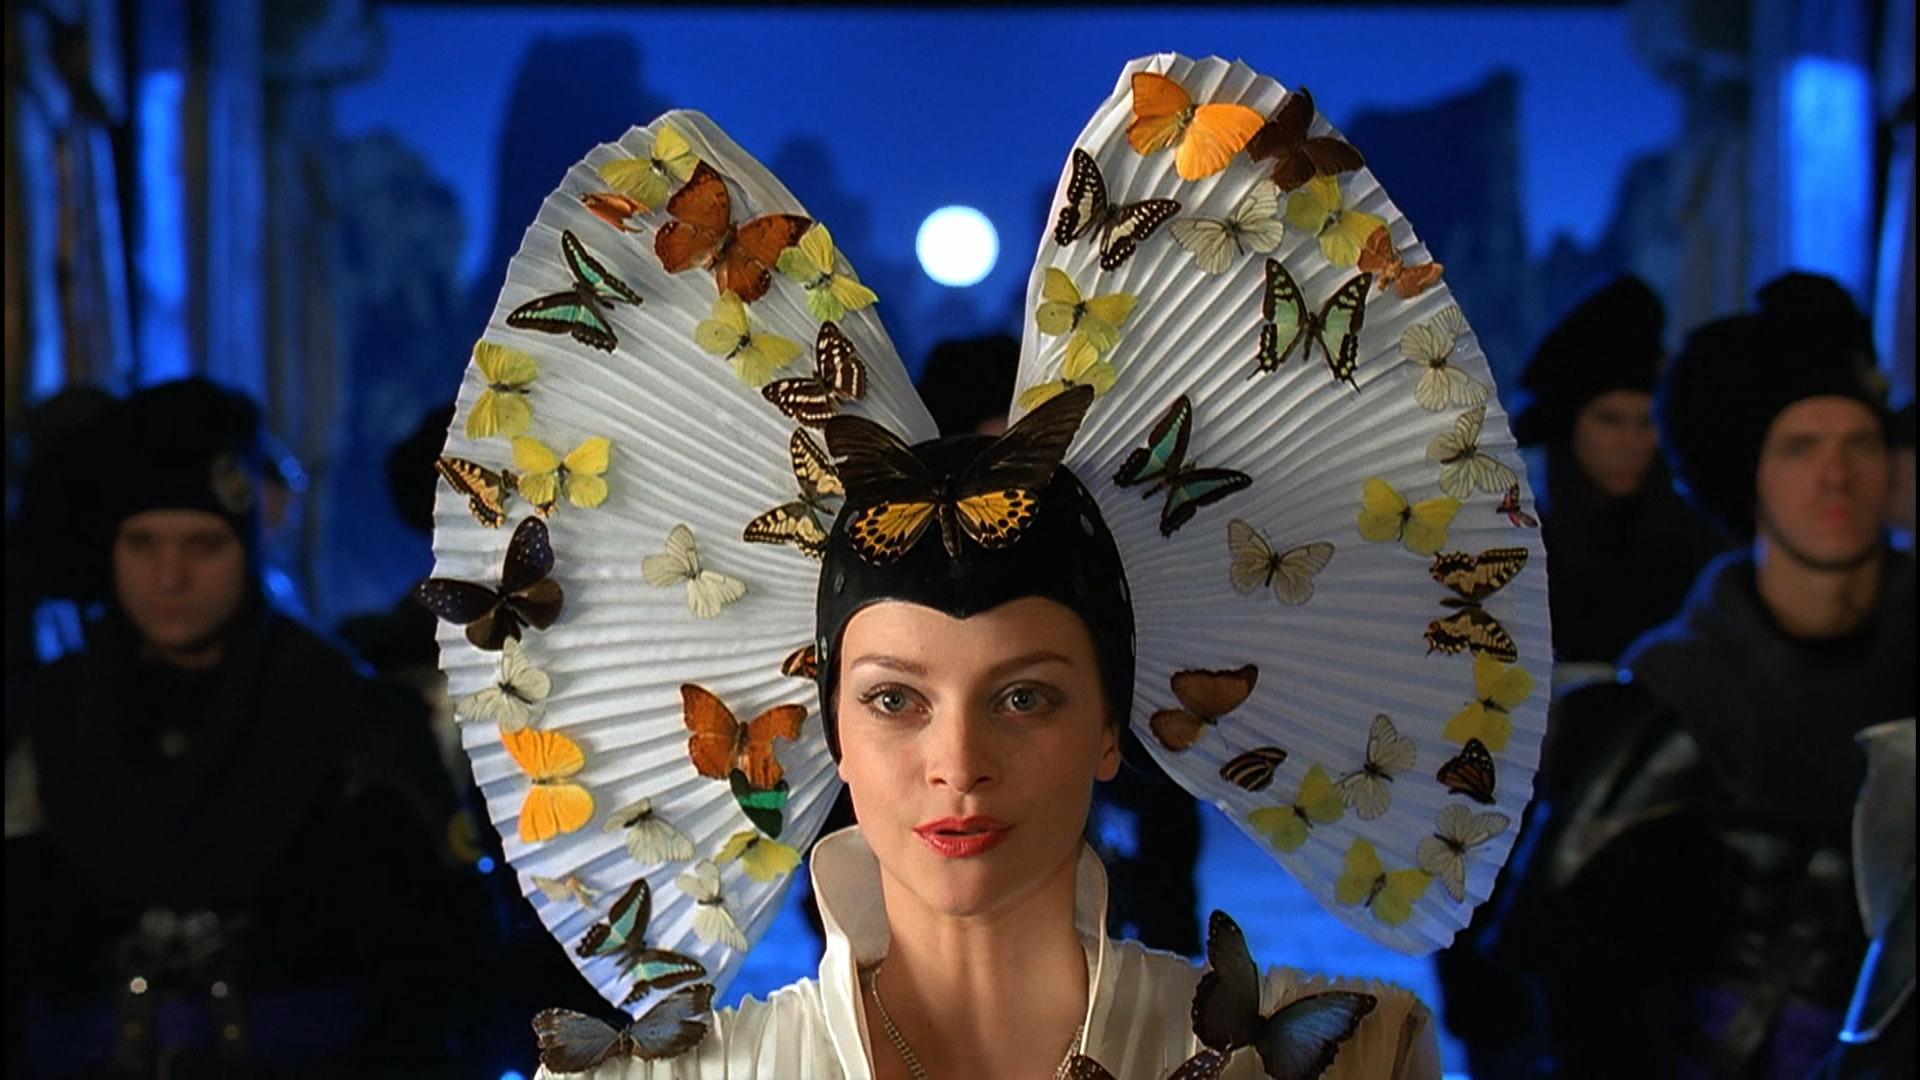 Frank-Herbert-Dune-Princess-Irulan-played-by-Julie-Cox